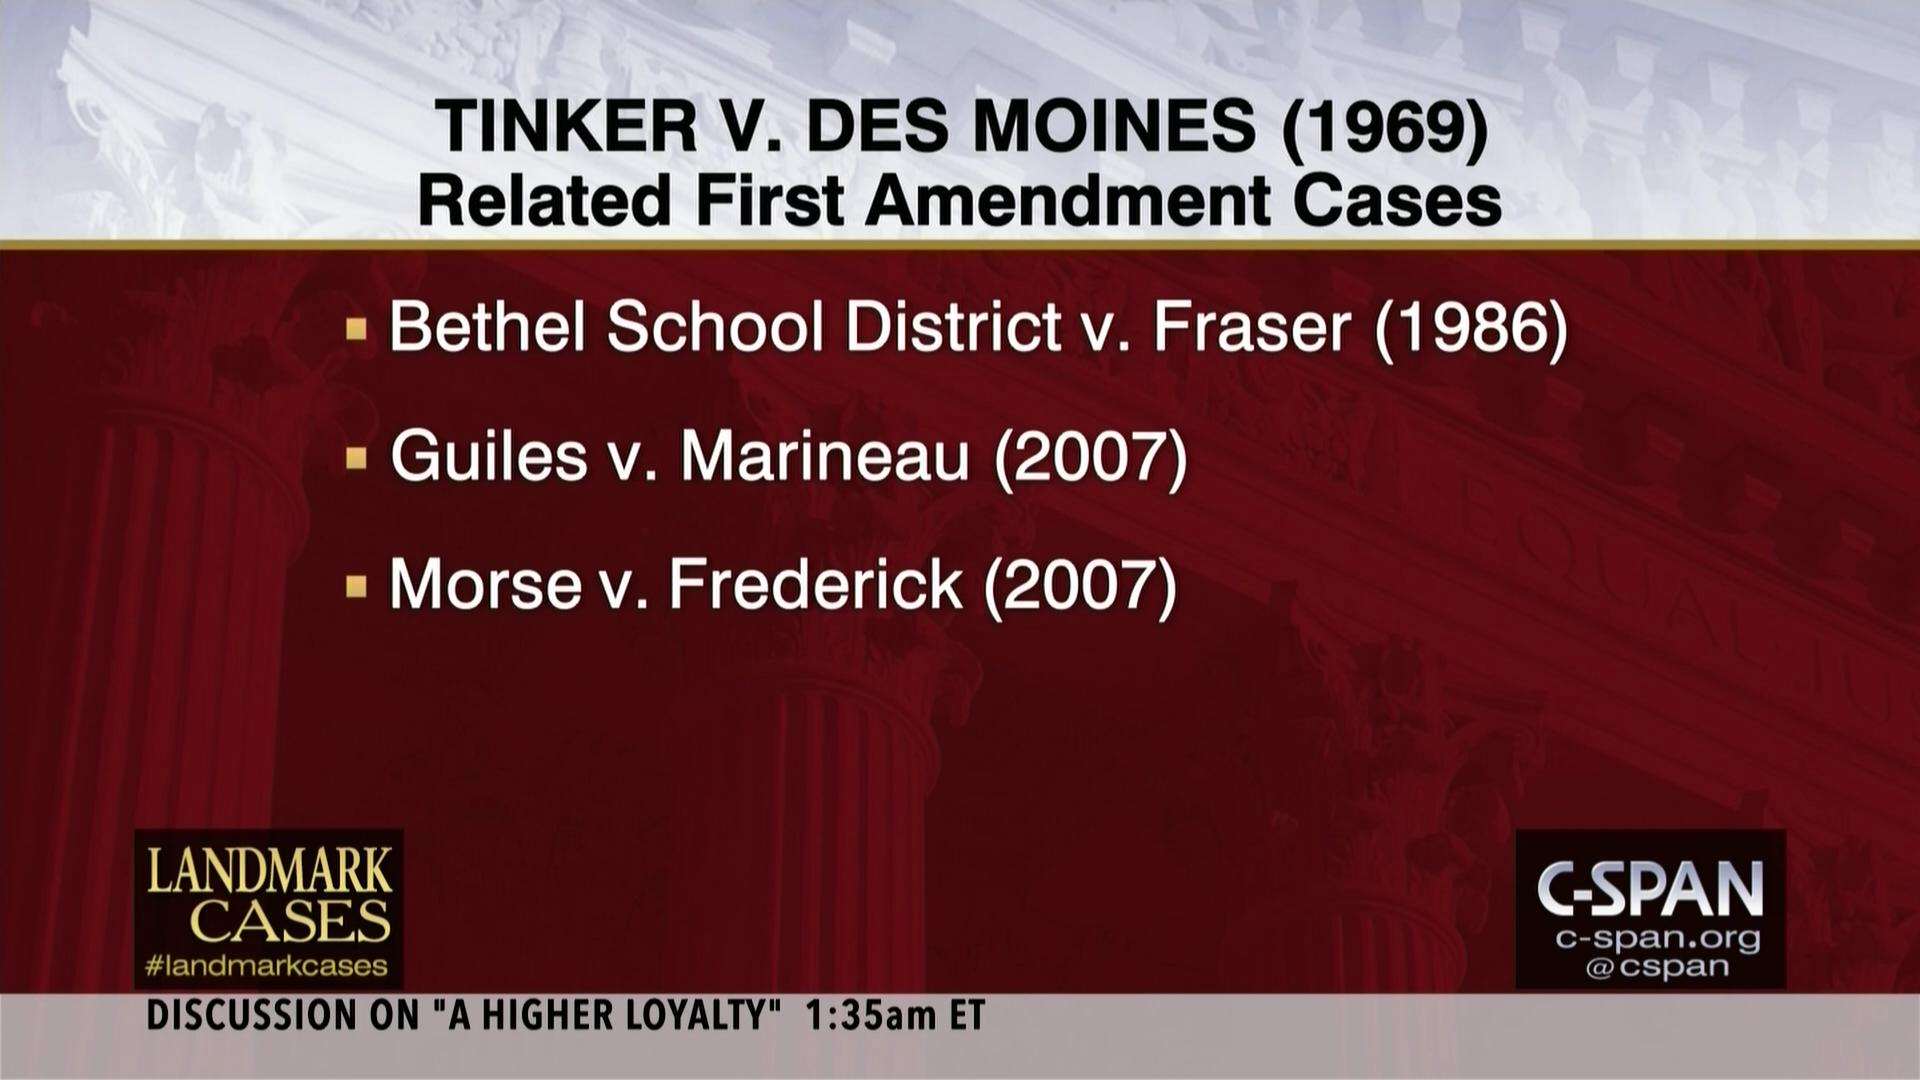 Tinker v des moines impact